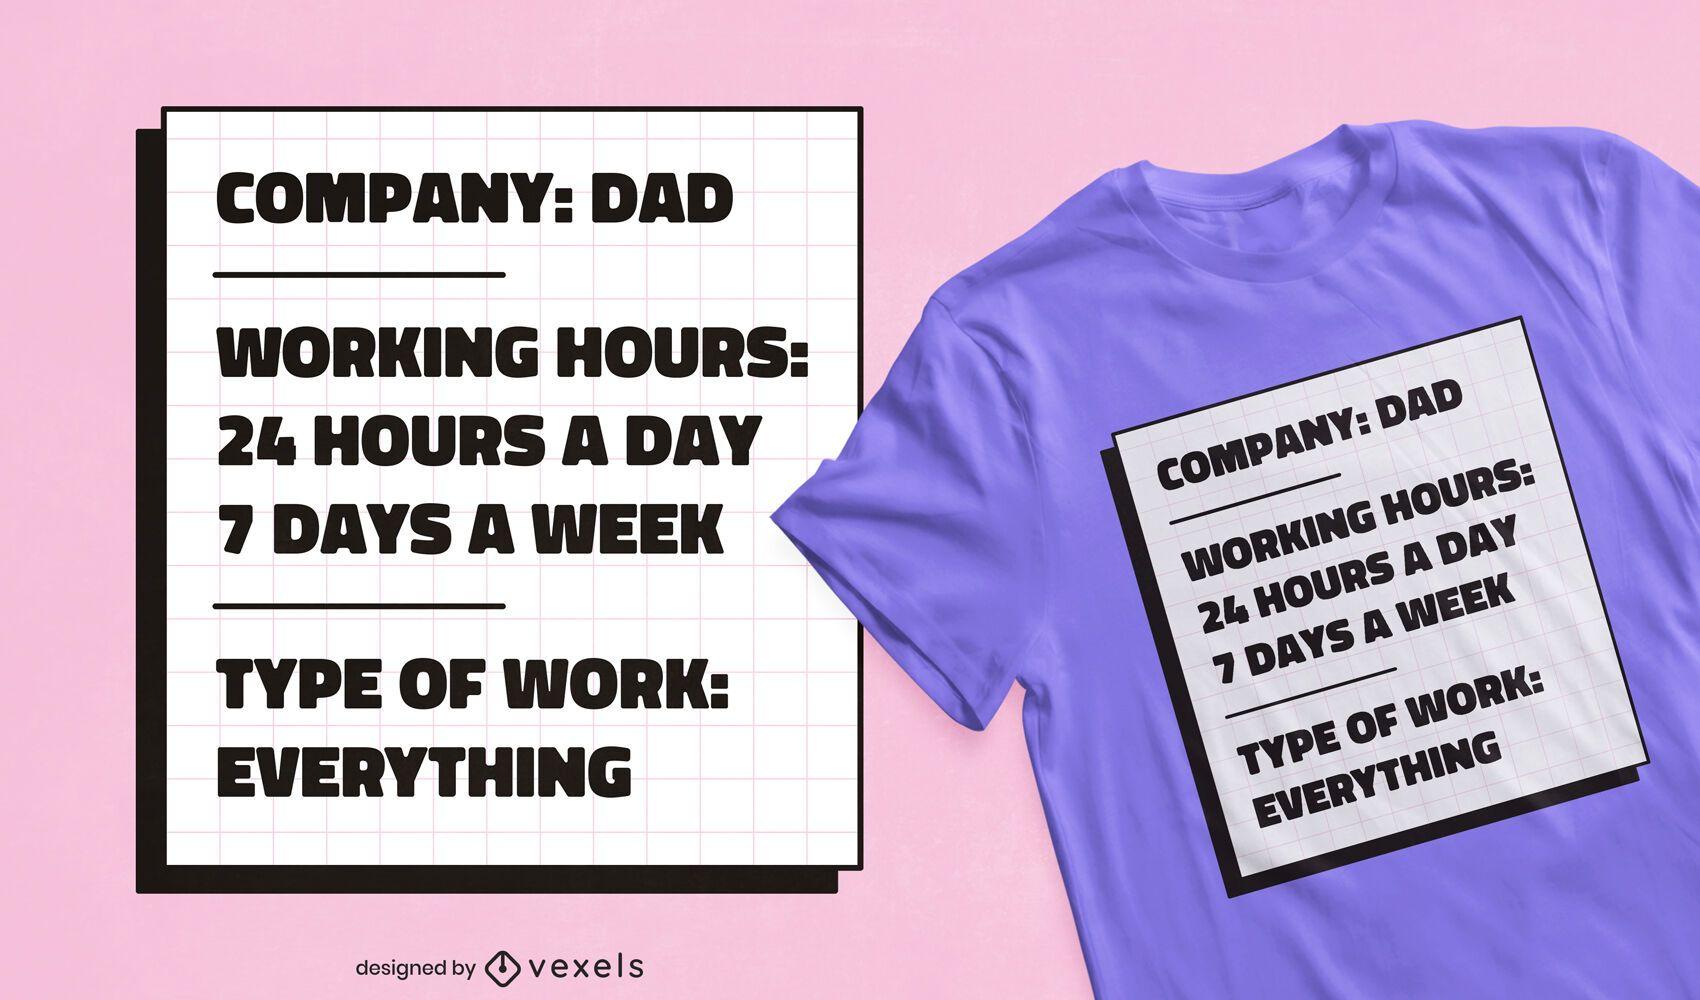 Diseño de camiseta de papá.